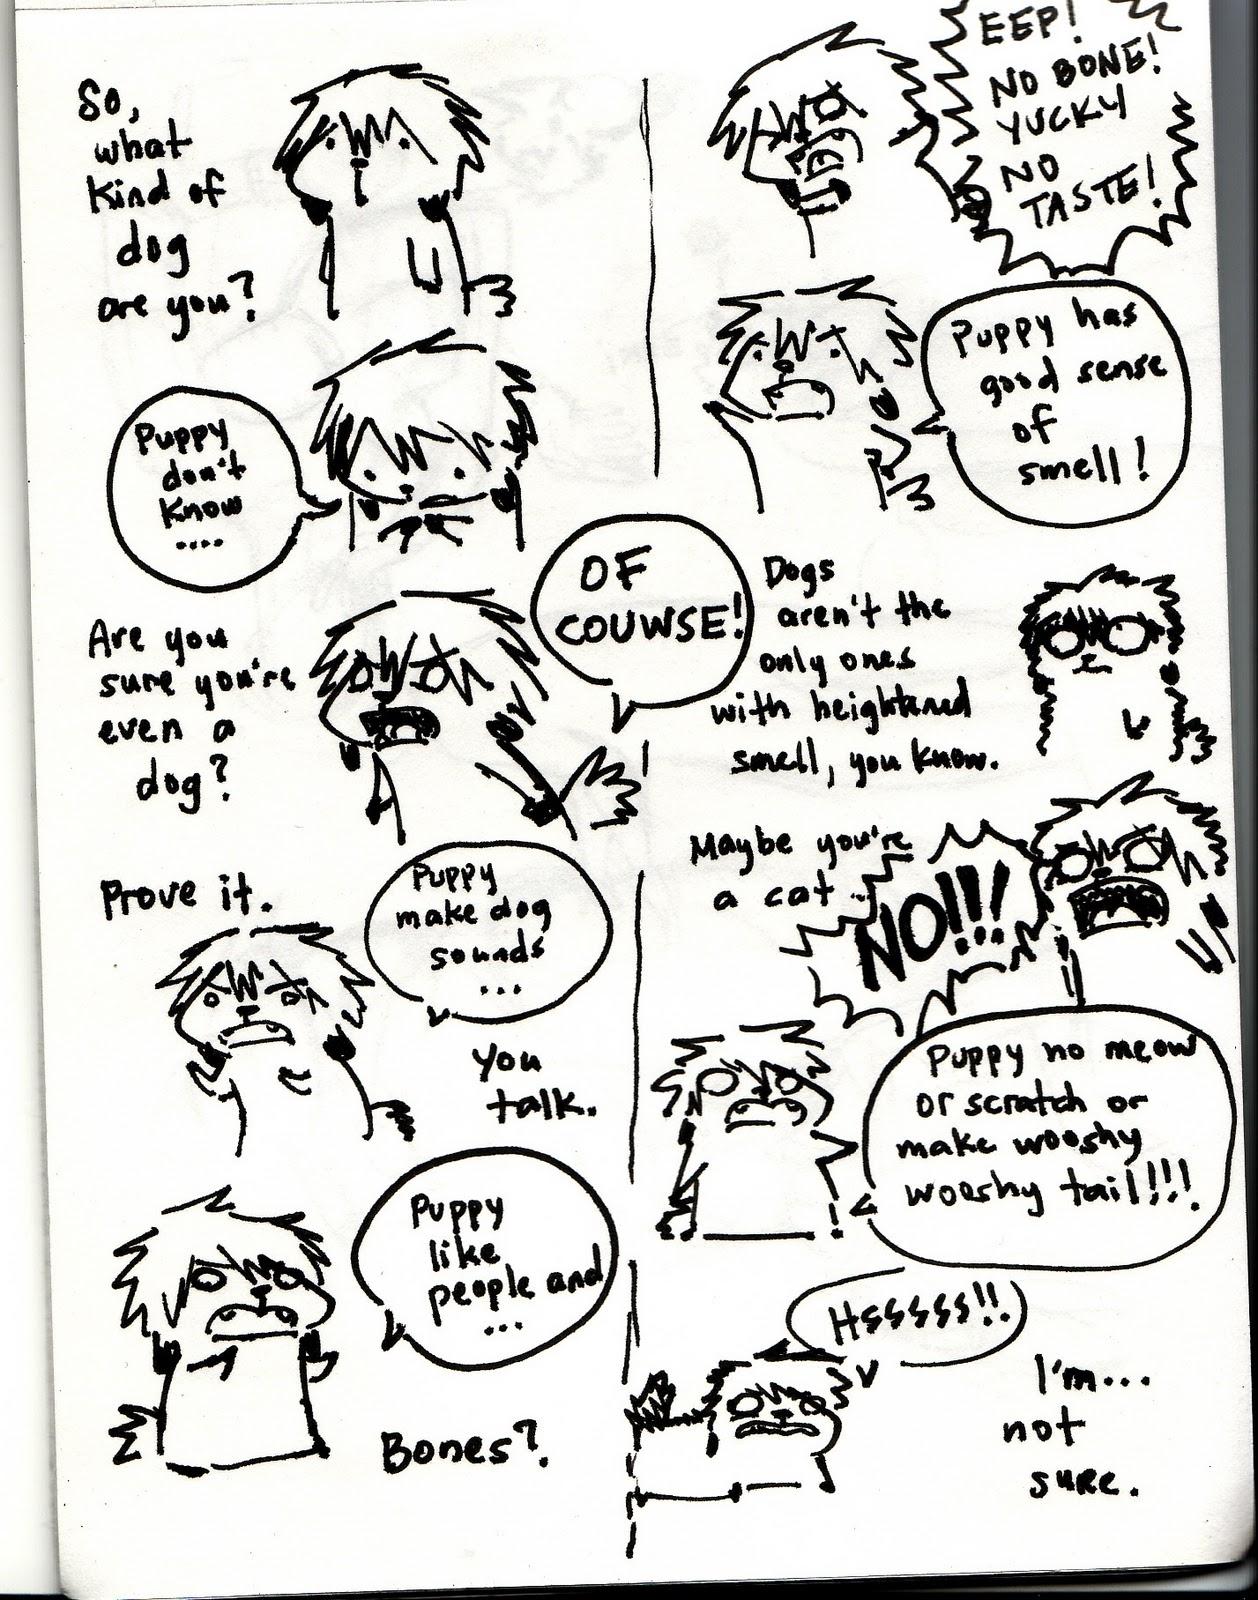 Drawn comics well Quite comics Puppy Stop: of